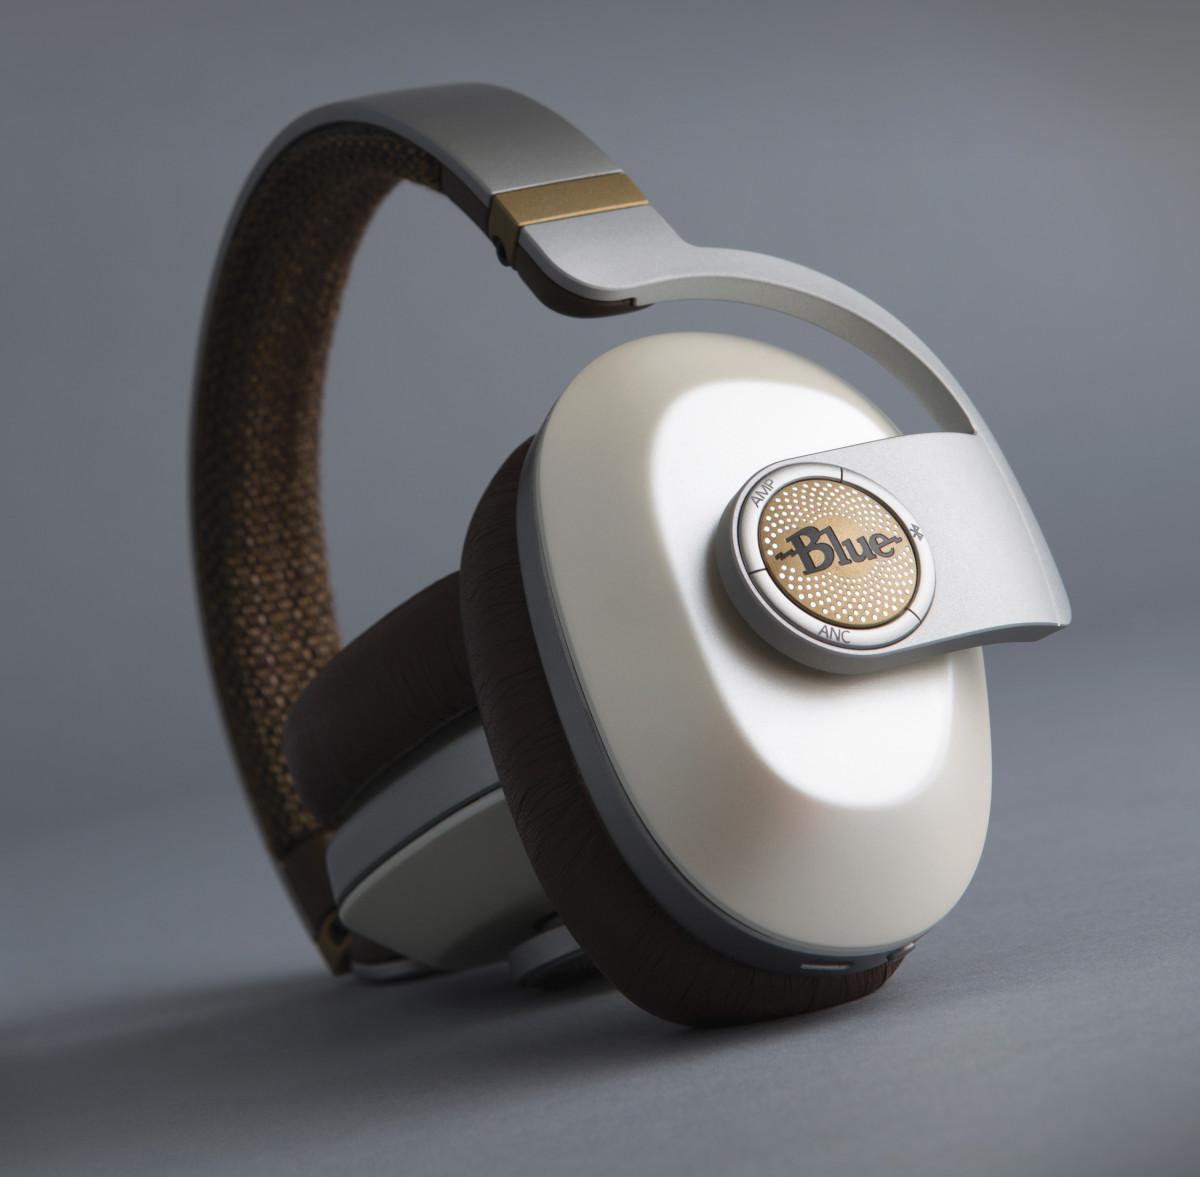 Blue Satellite Noise Cancelling headphones